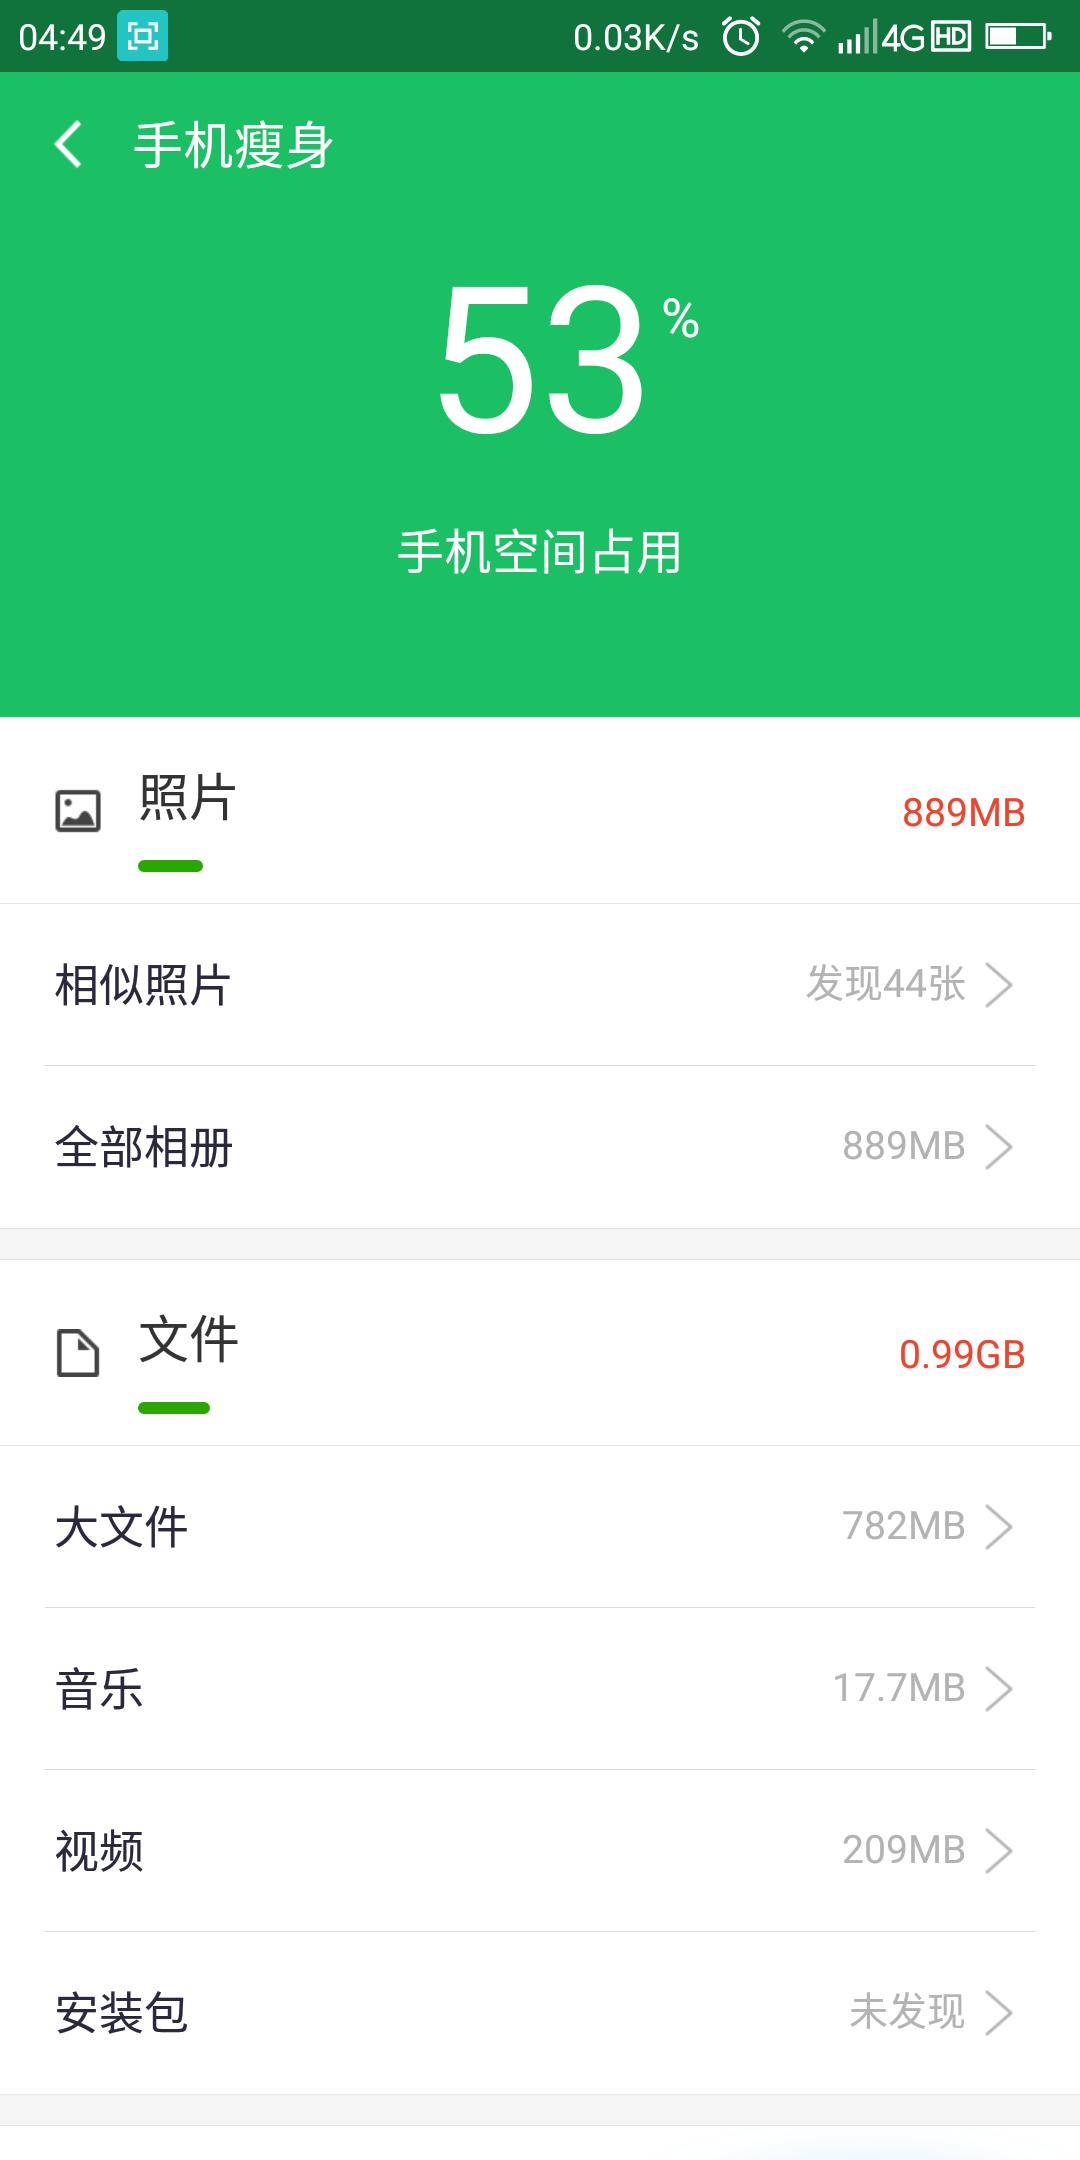 Screenshot_2019-08-28-04-49-14.png